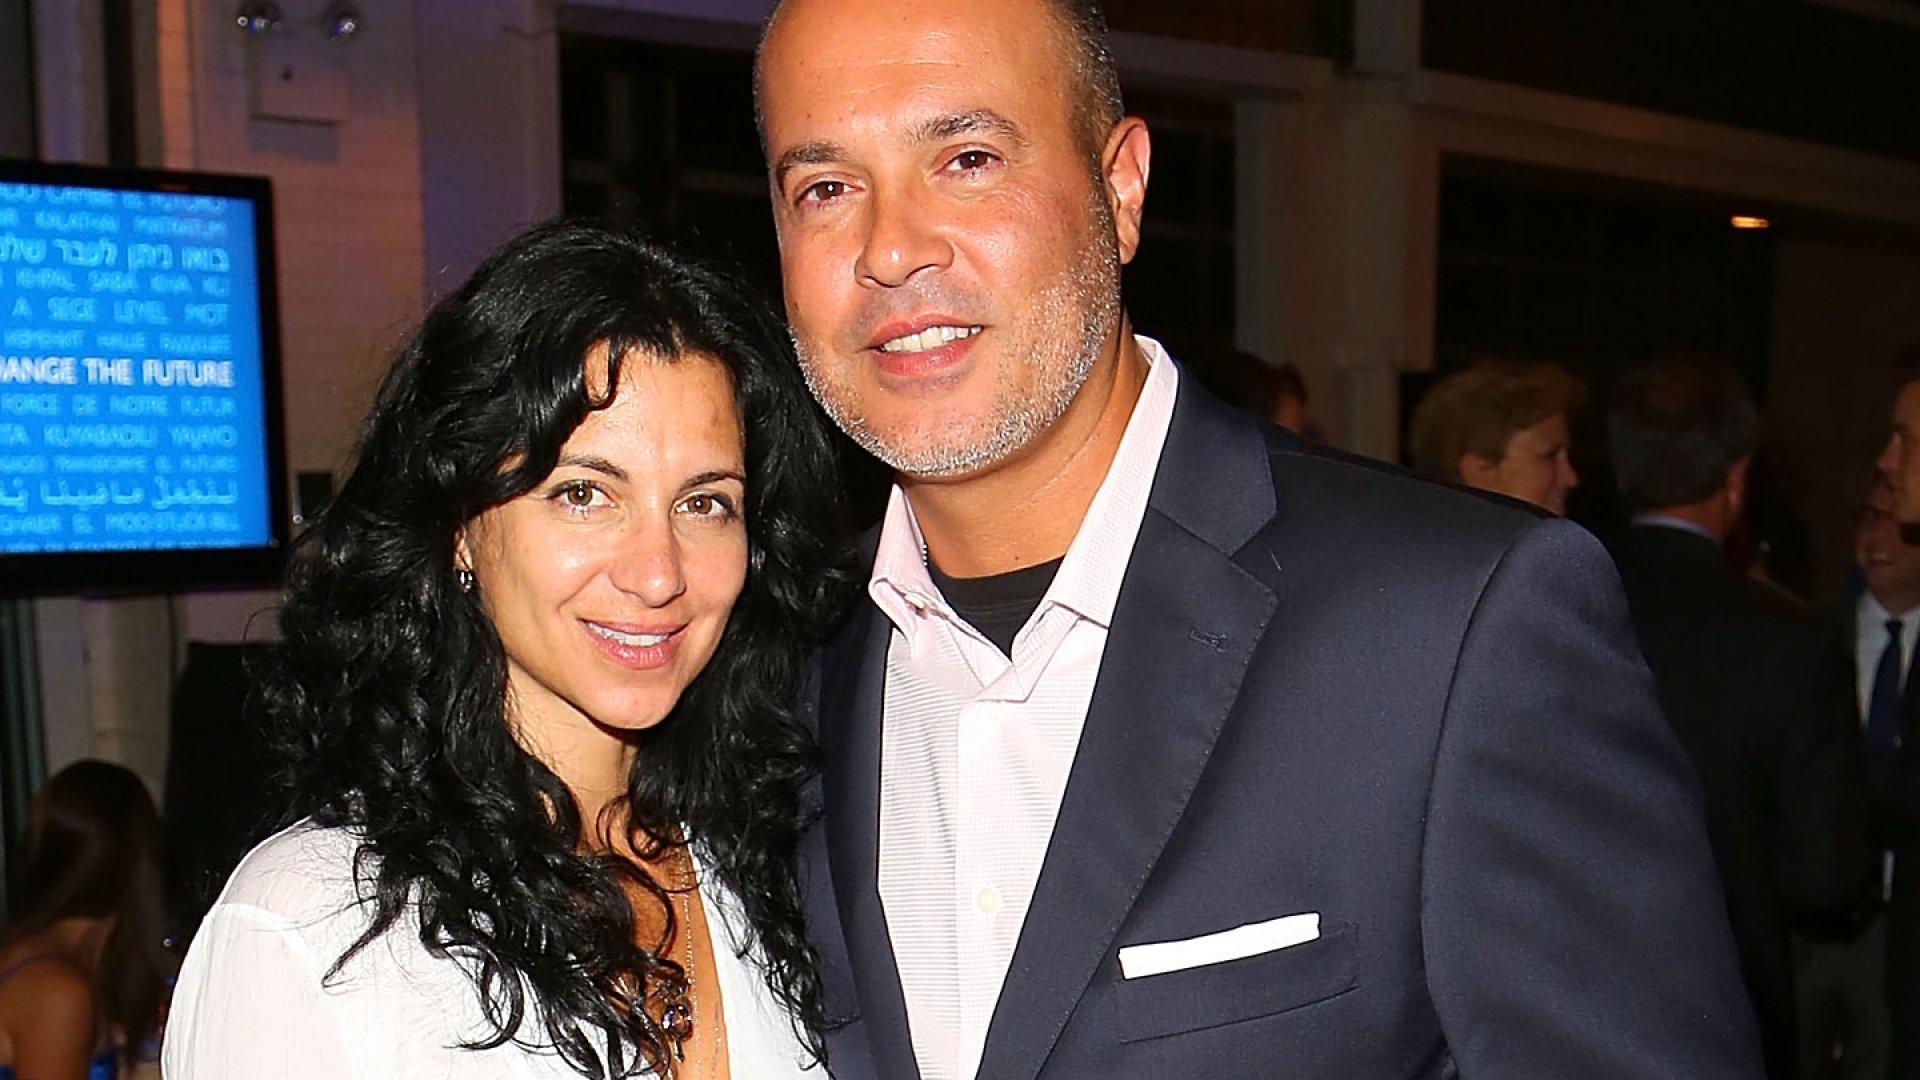 Designer Carolyn Rafaelian and CEO Giovanni Feroce both of Alex and Ani